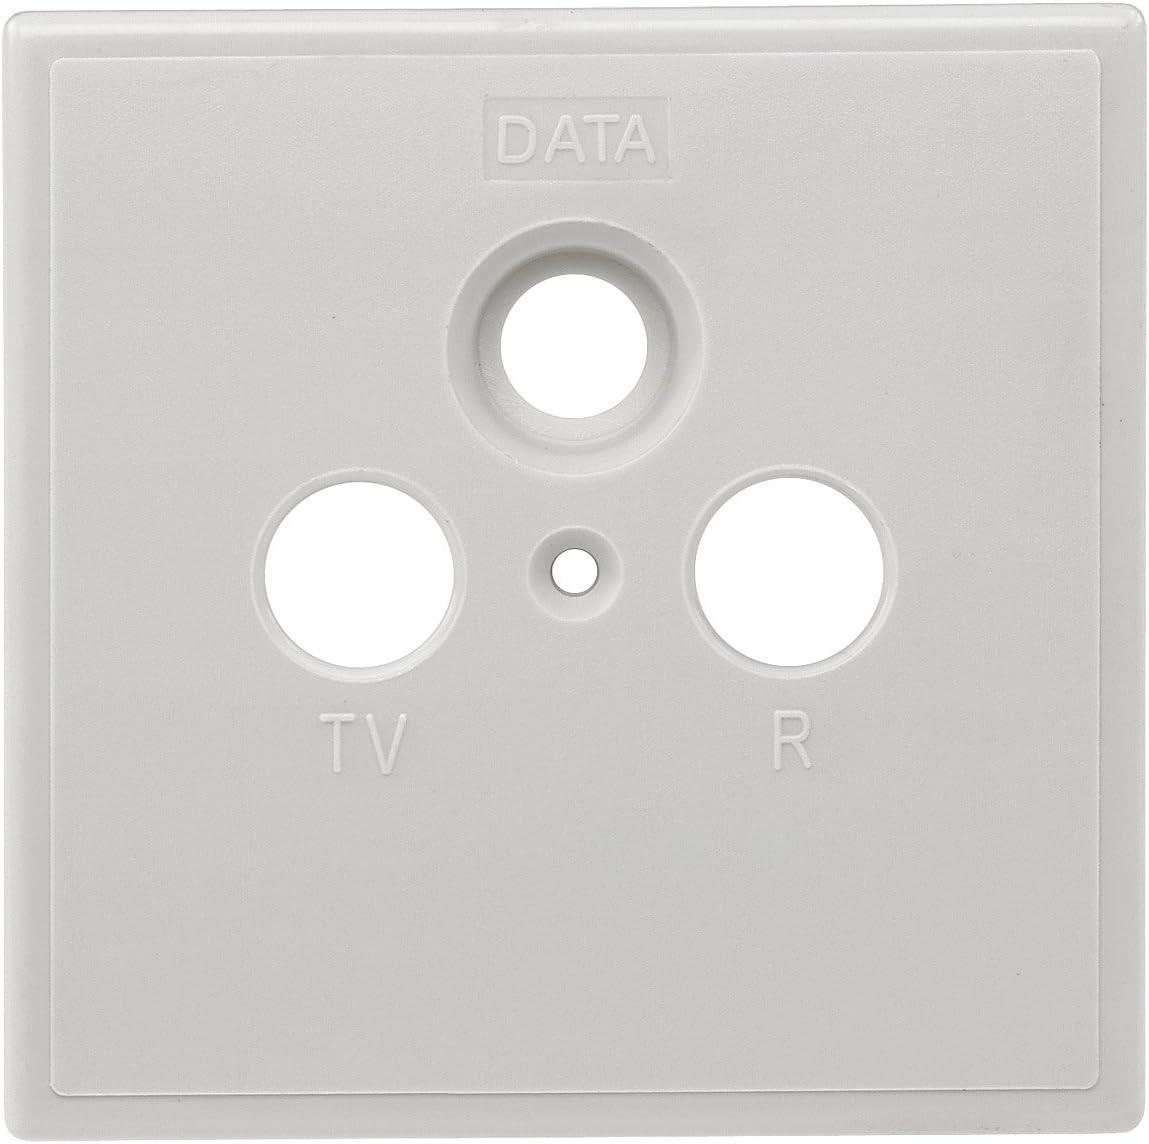 Axing Szu 2 01 Steckdosen Abdeckung Einteilig Tv R Elektronik